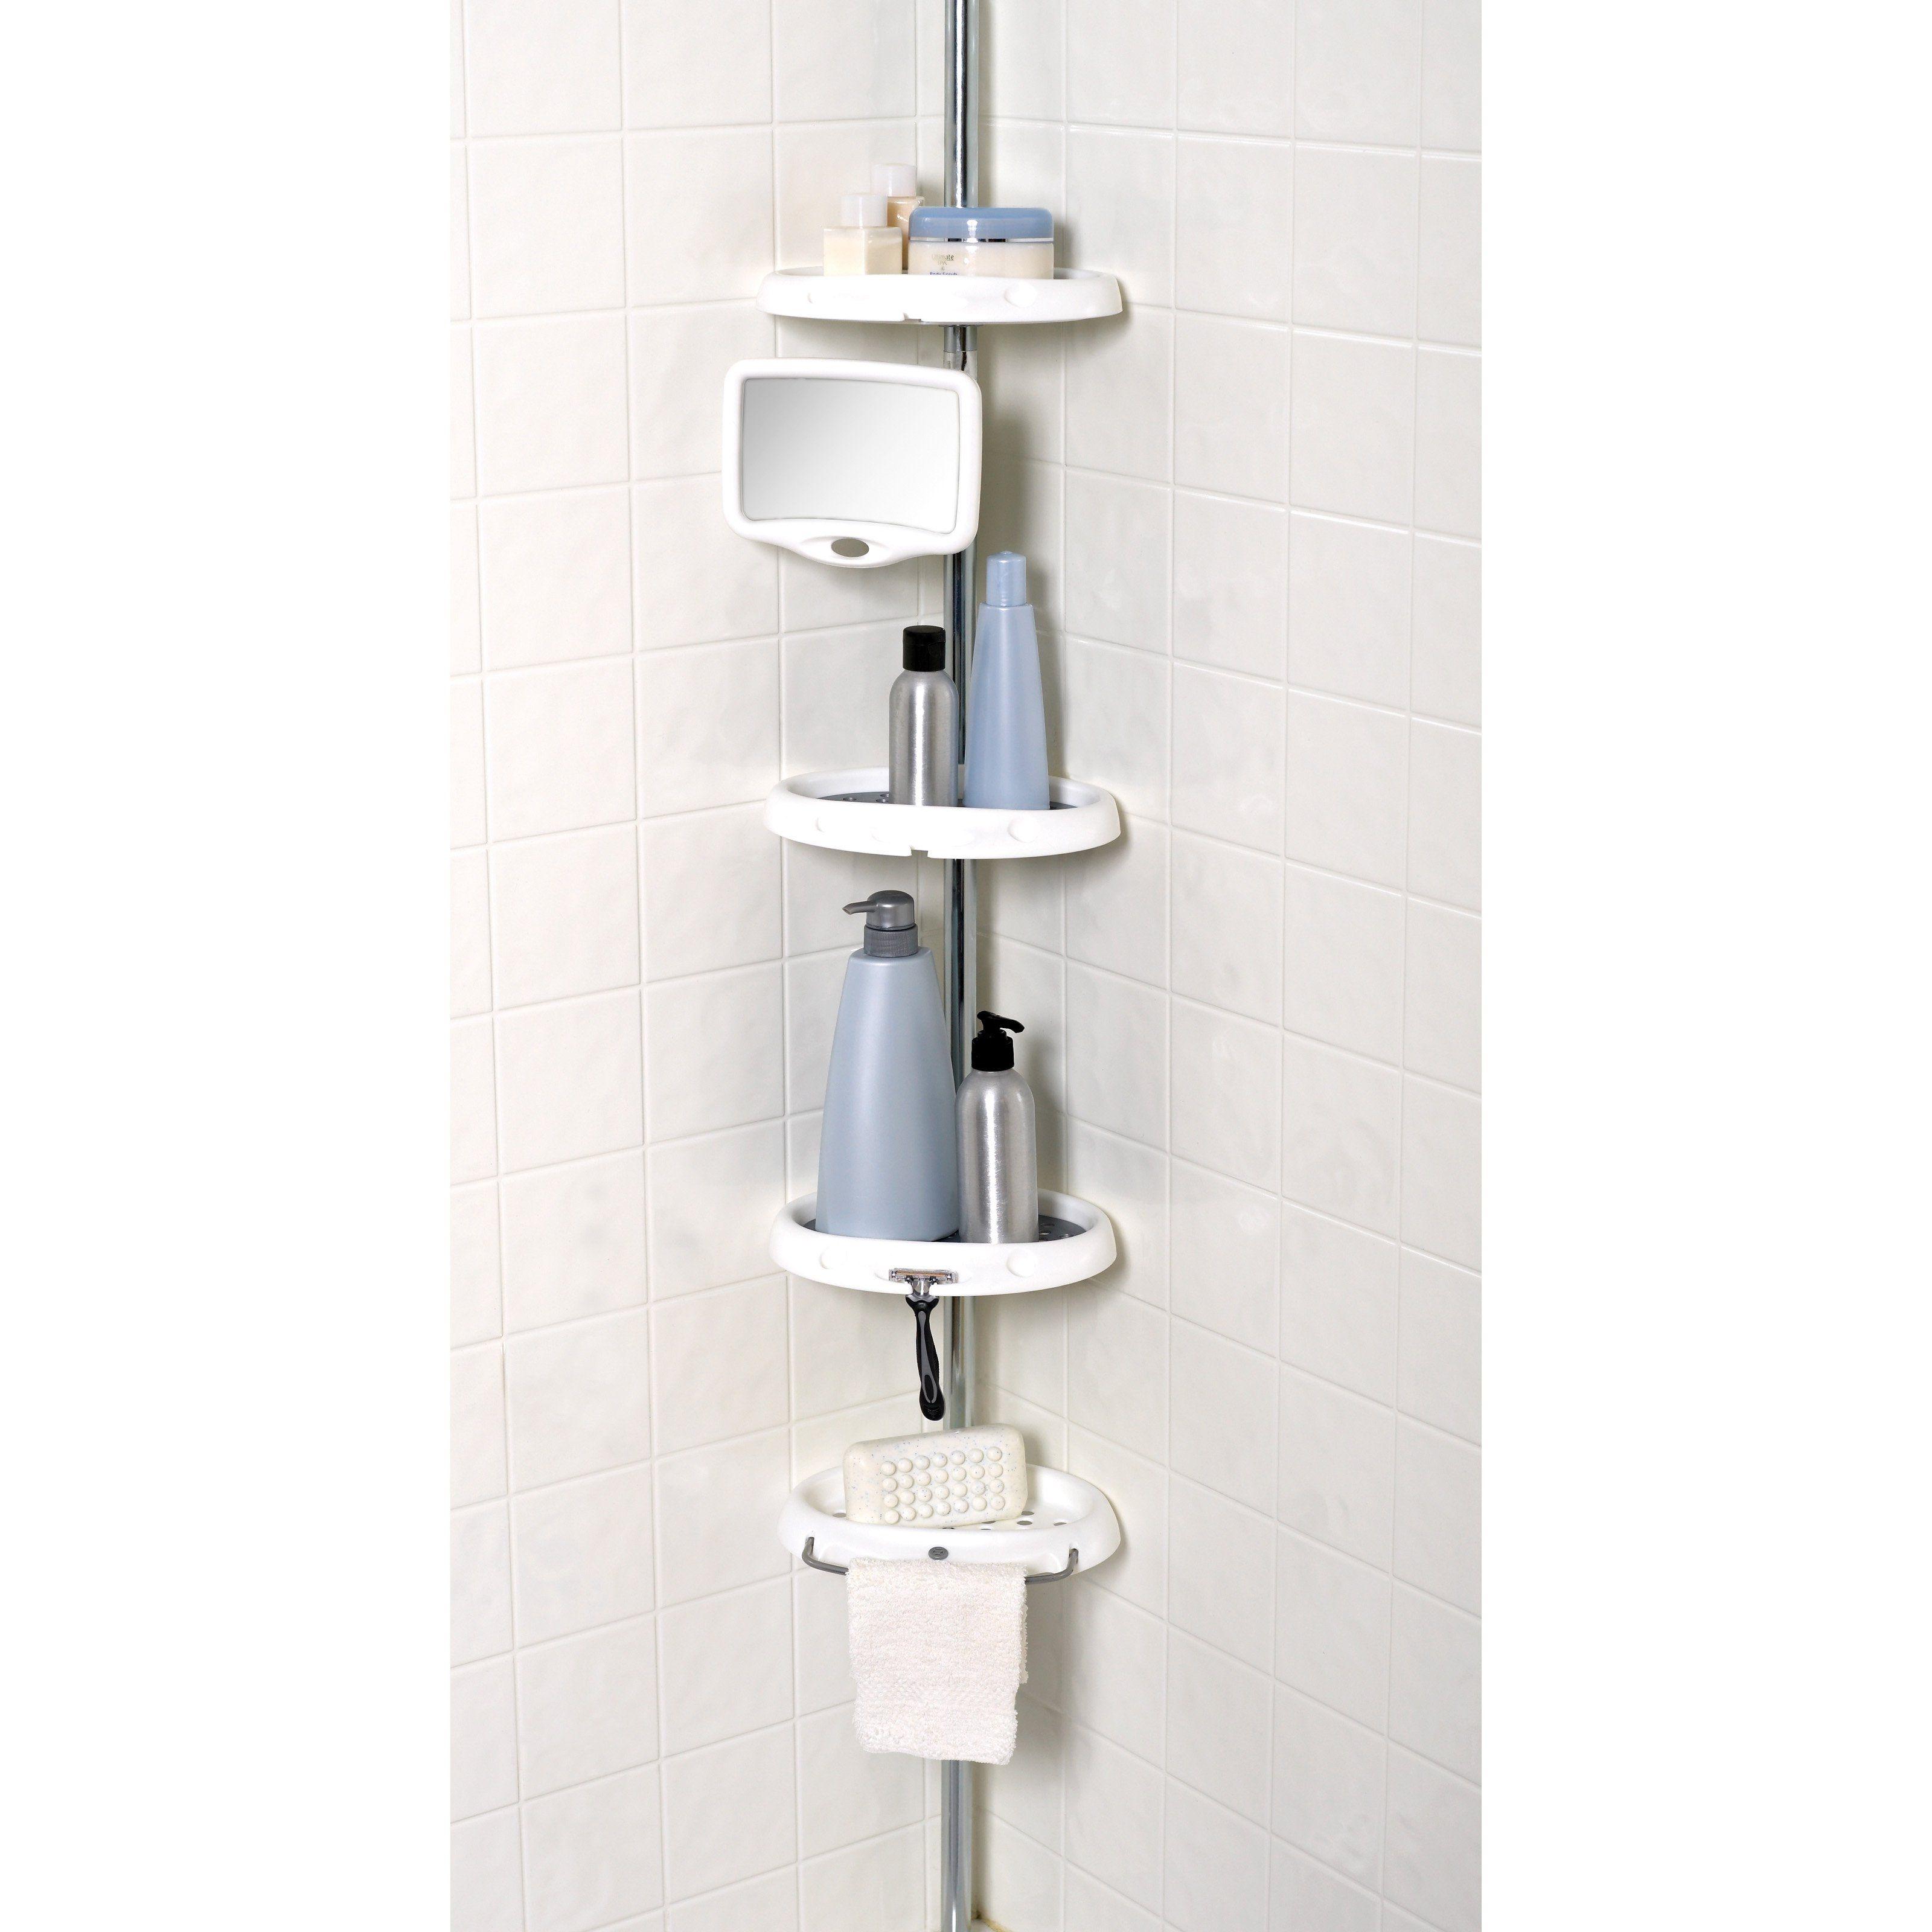 Rubbermaid Corner Shower Caddy | Bathroom Utensils | Pinterest